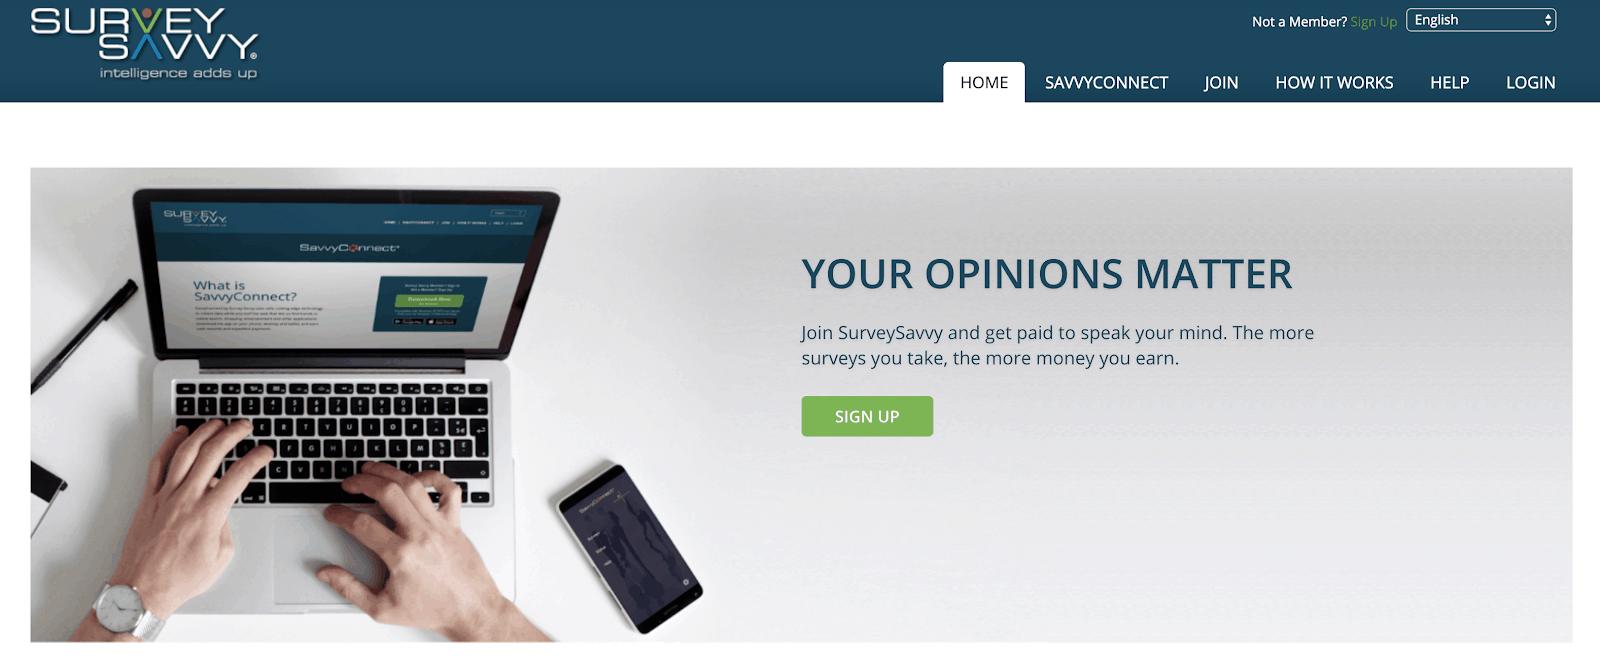 Survey Savvy